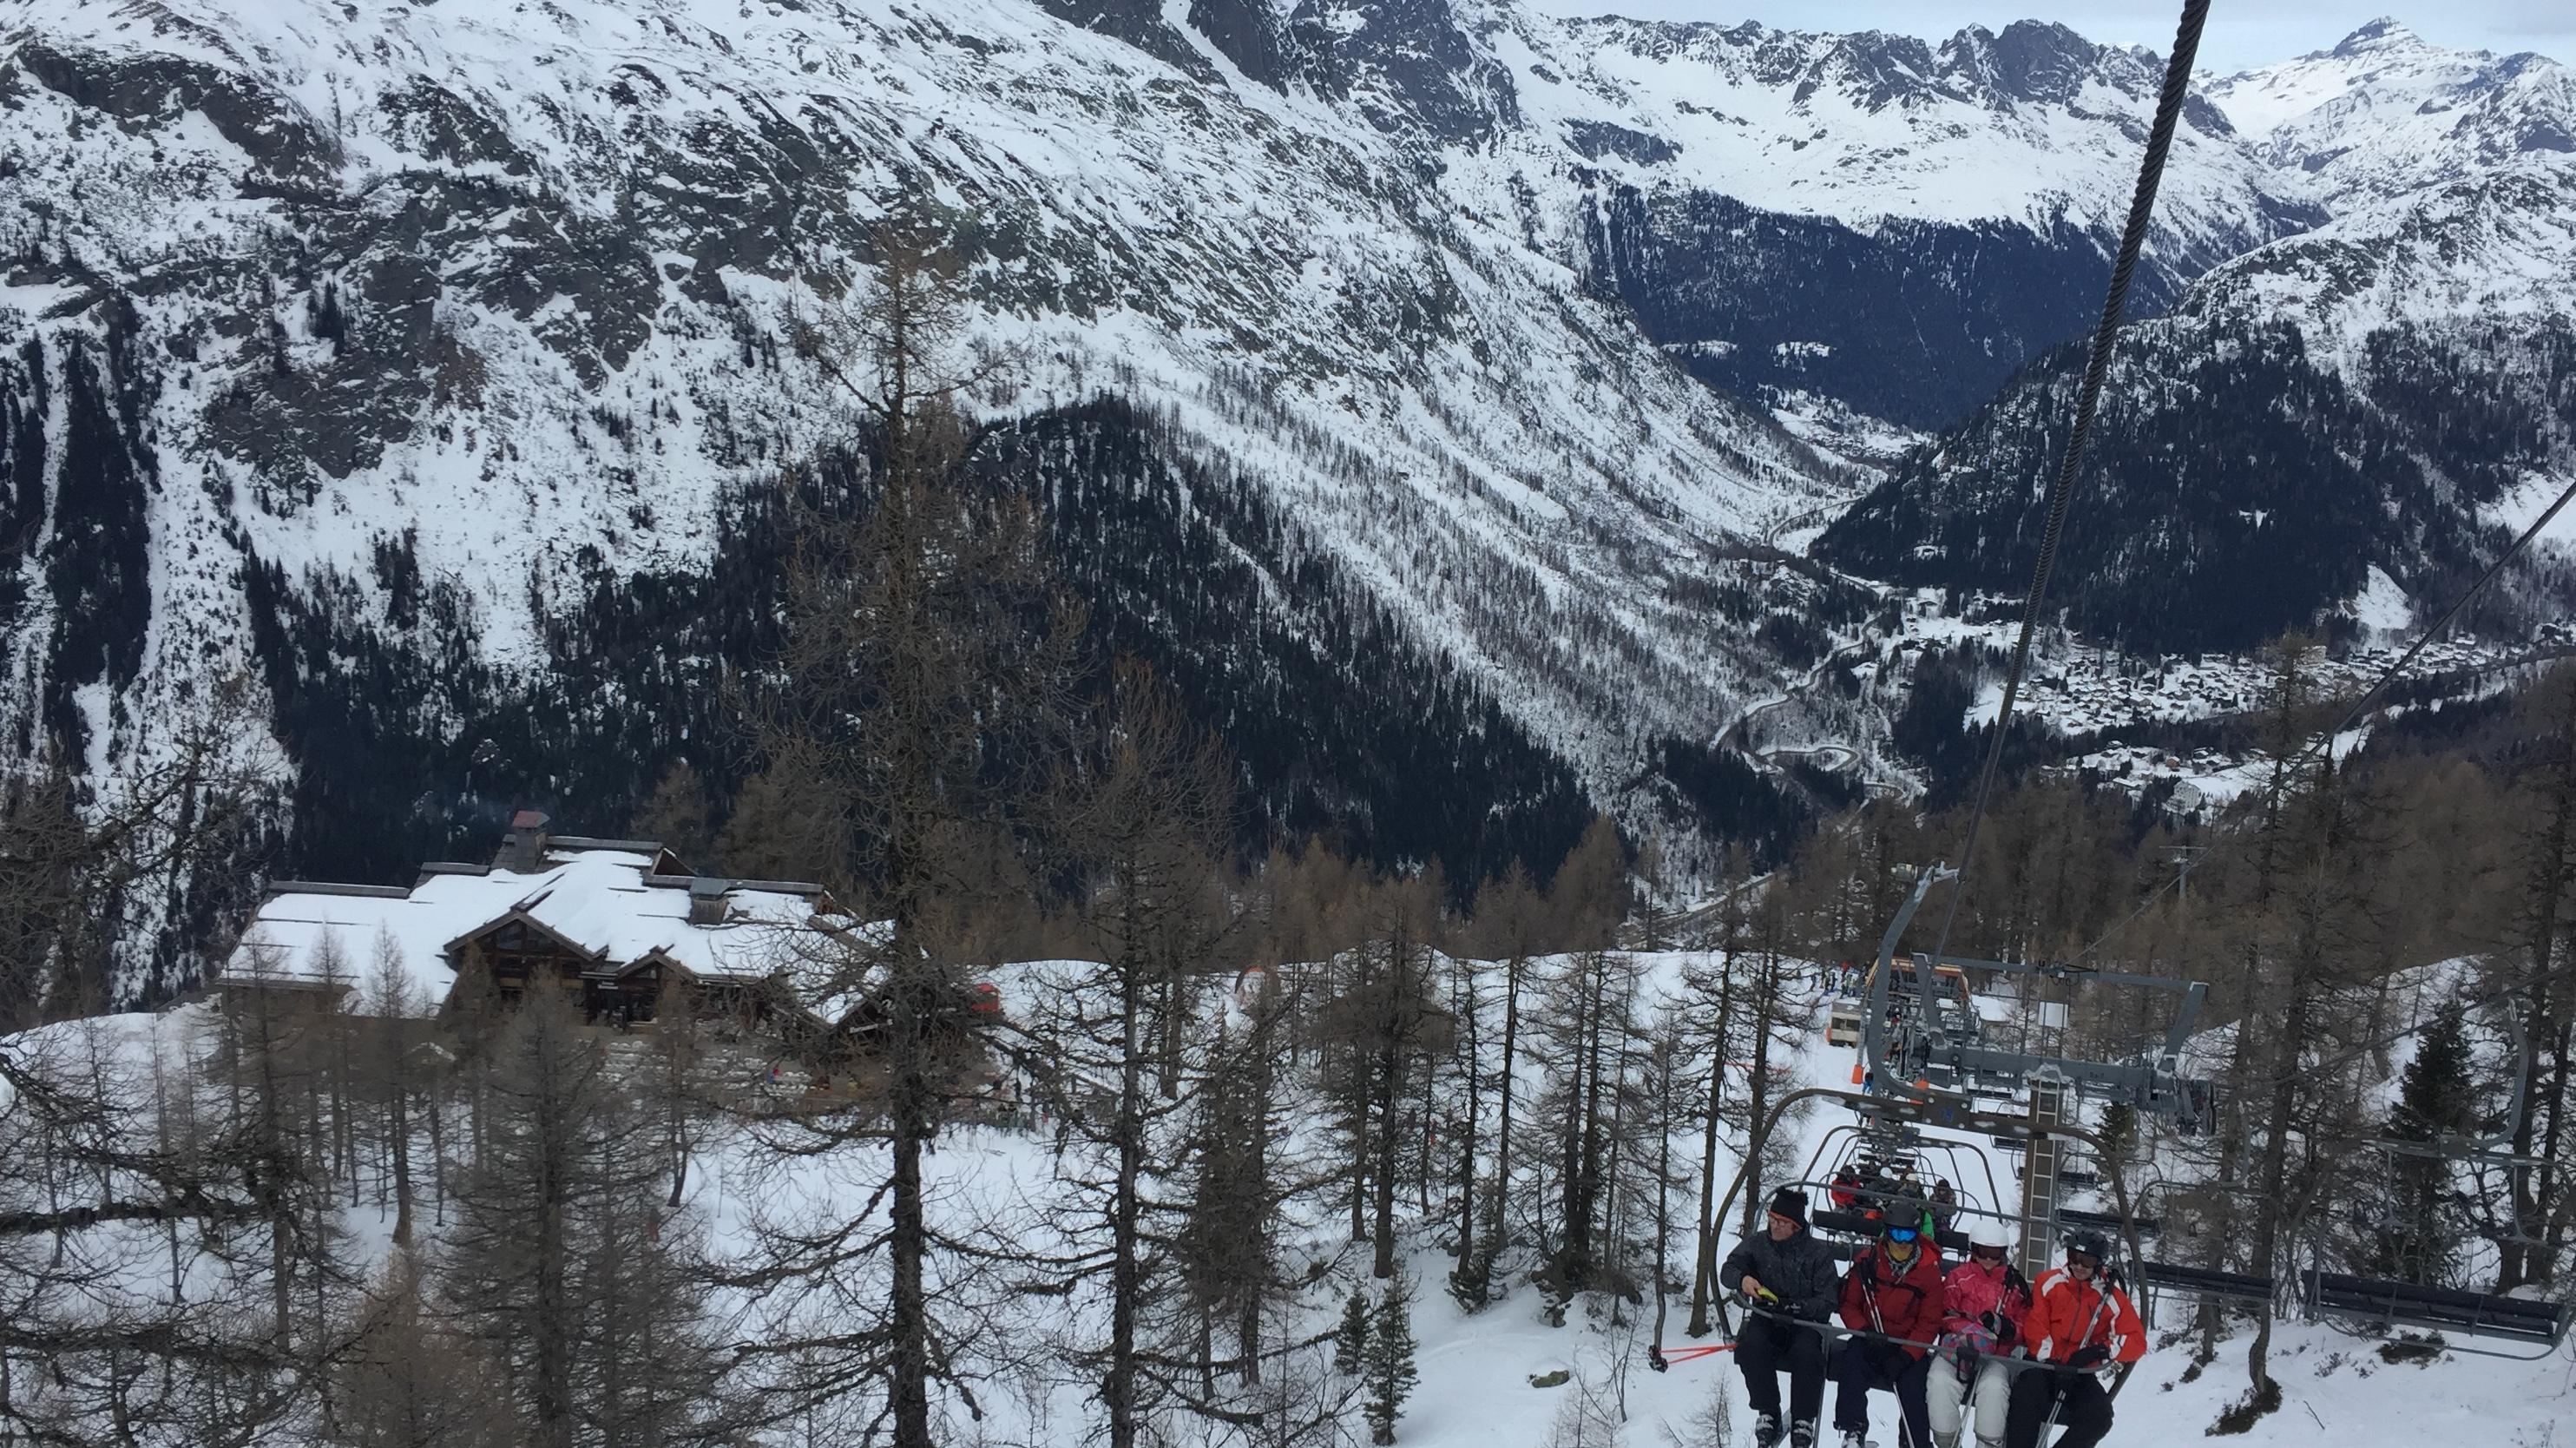 not so good on the snow, Chamonix